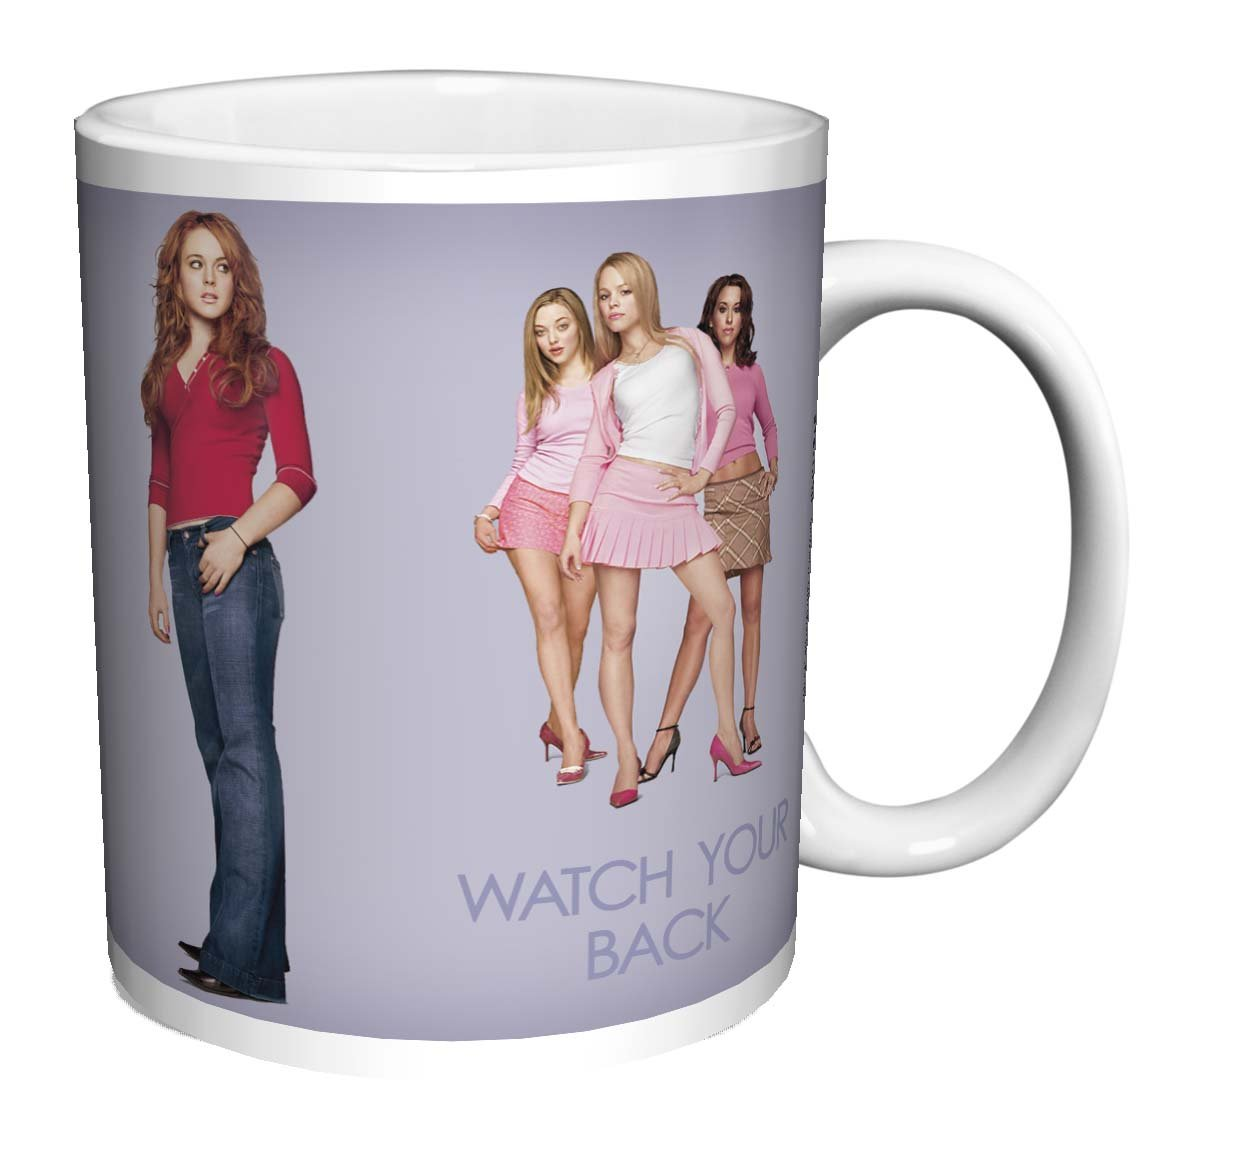 Mean Girls Watch Your Back Teen Comedy Movie Film Ceramic Gift Coffee (Tea, Cocoa) (11 OZ C HANDLE CERAMIC MUG)